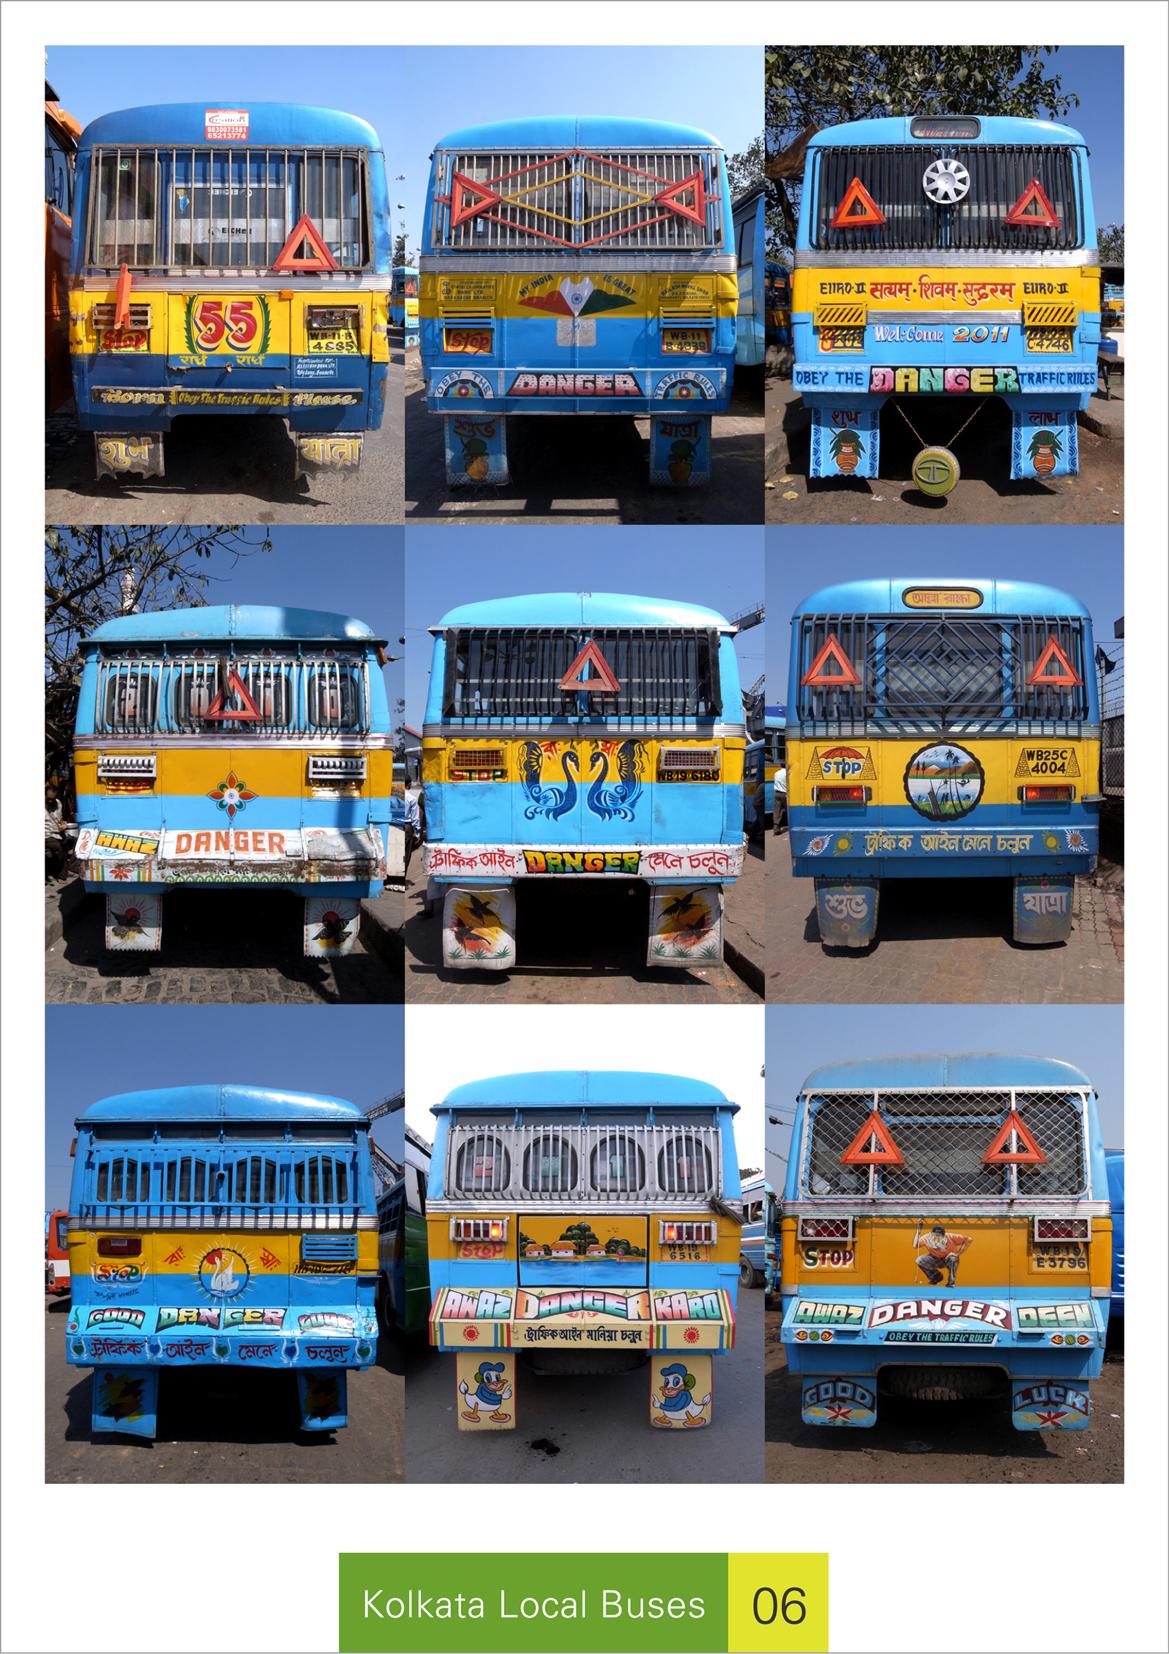 KolkataLocalBus-06.jpg